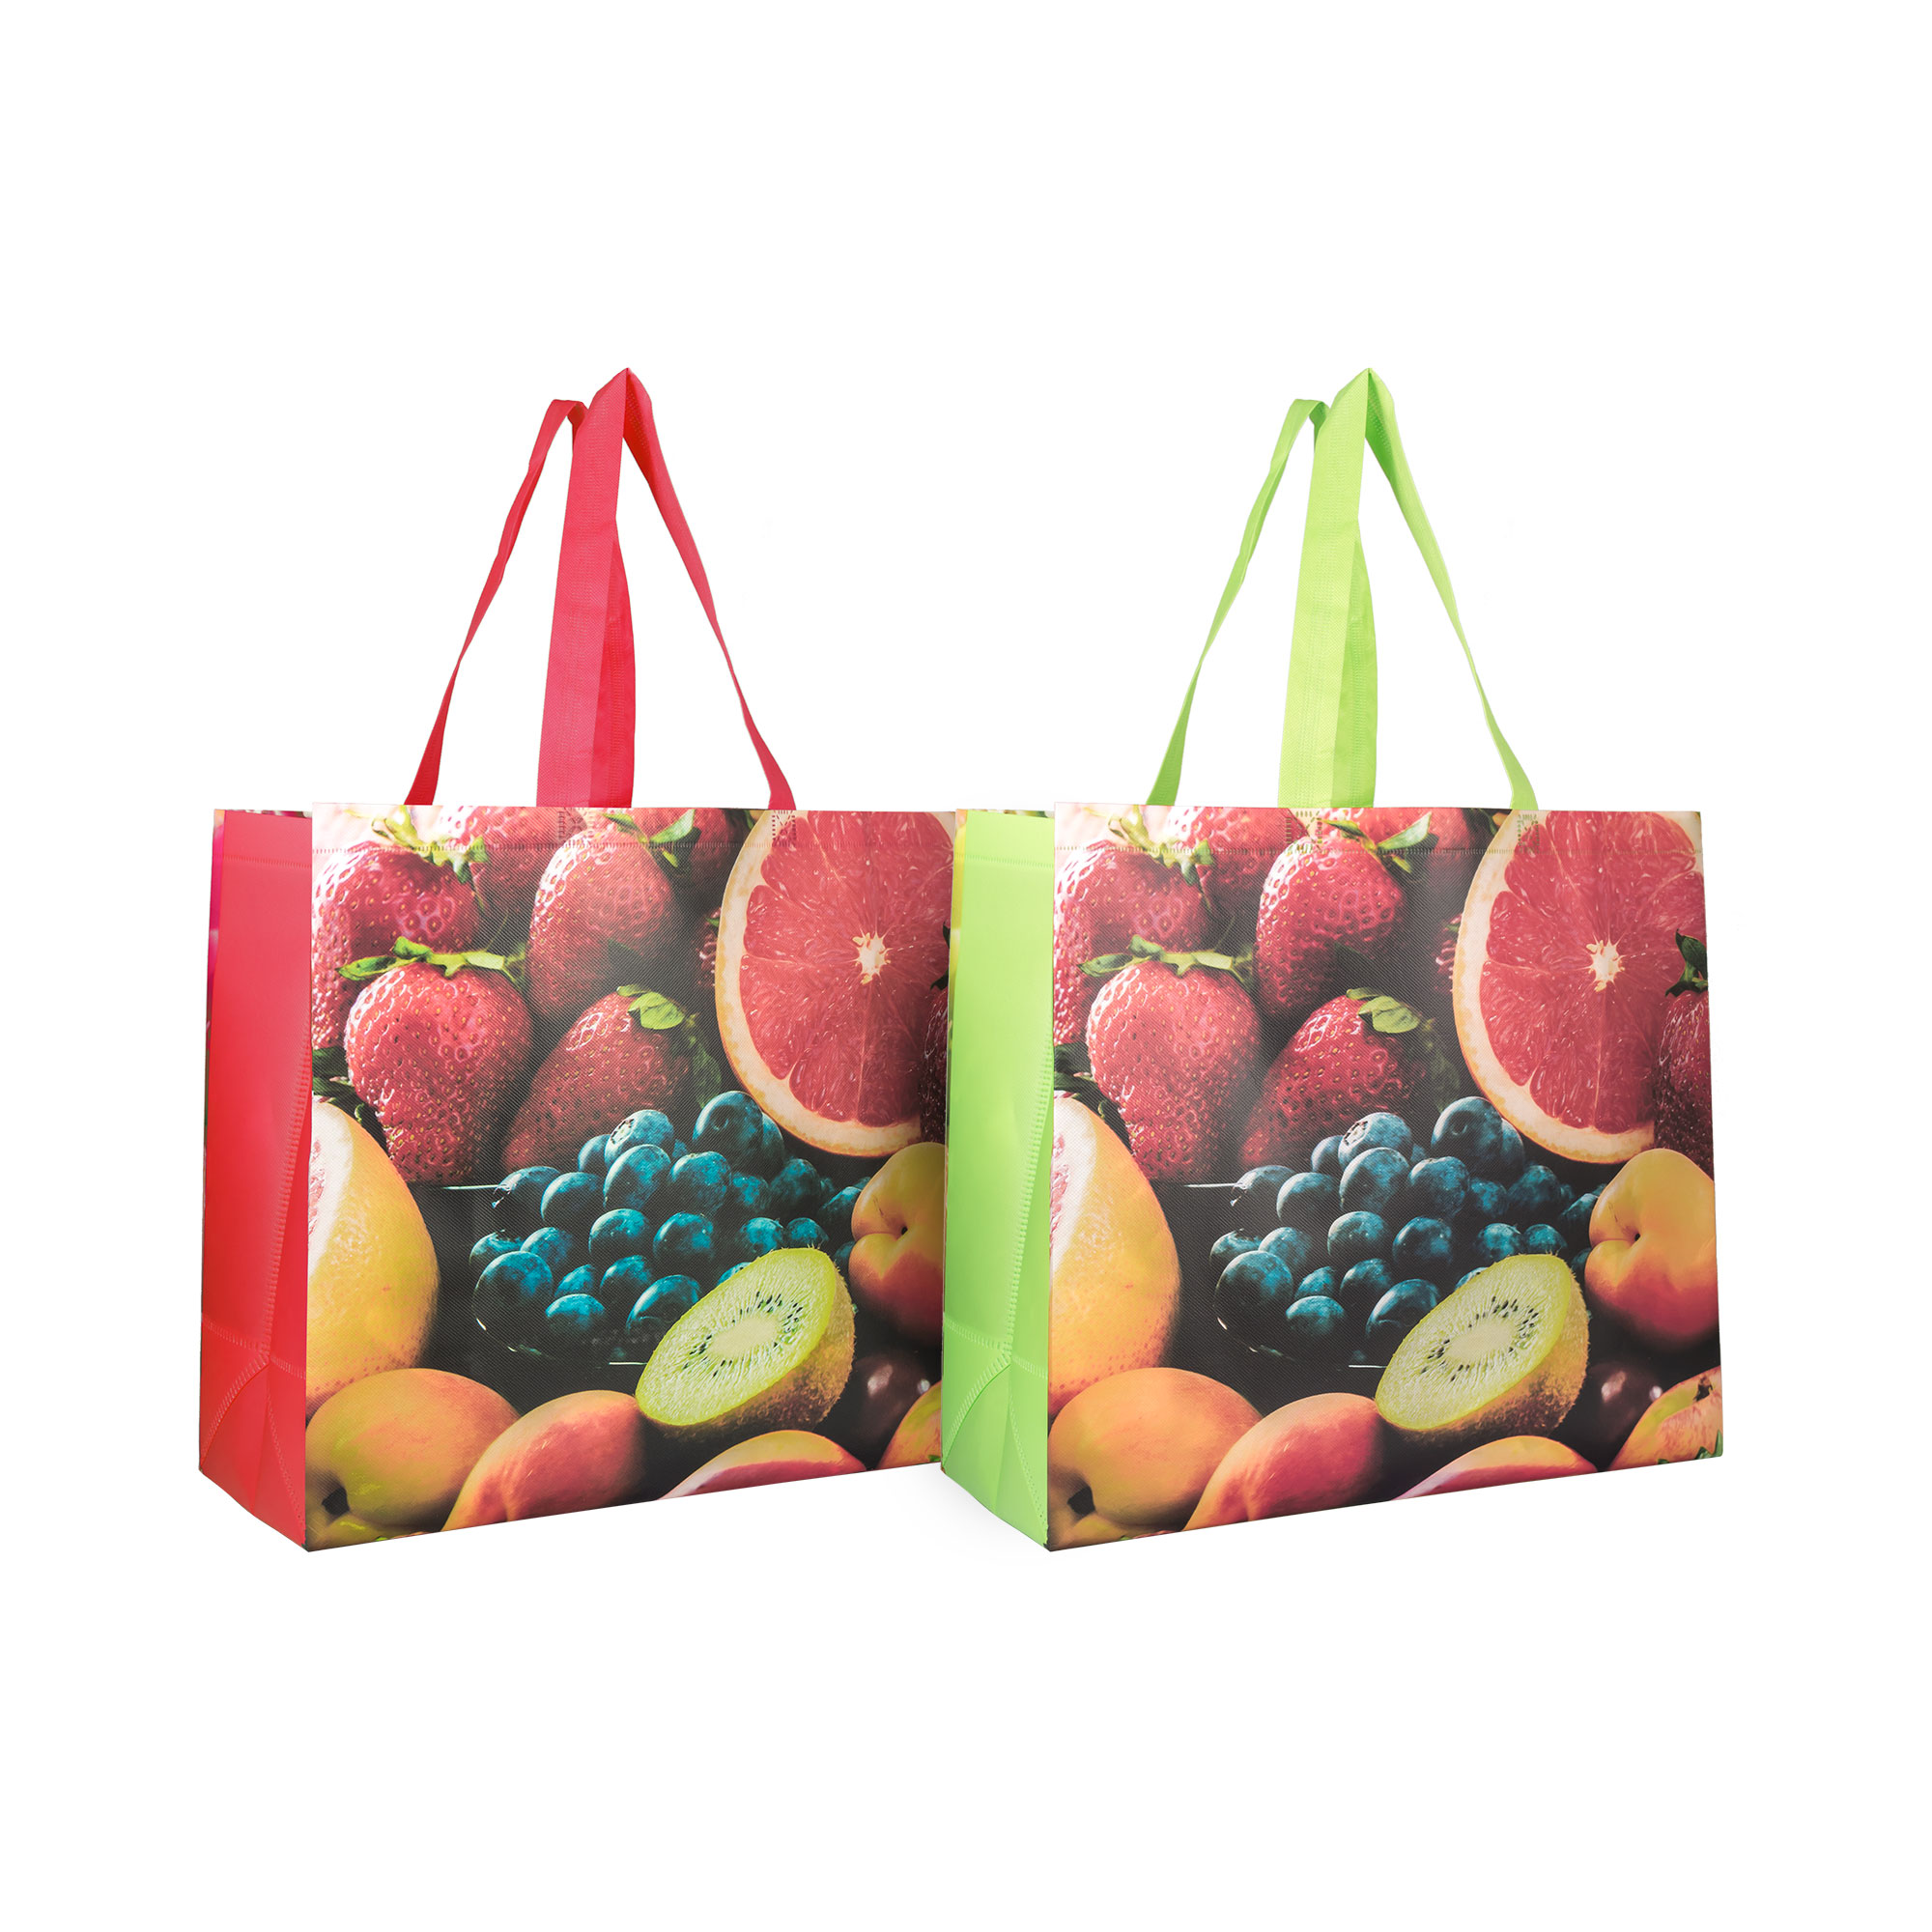 4f81515a319 Accessories :: Τσάντες & Πορτοφόλια :: Τσάντα οικολογική για ψώνια ...